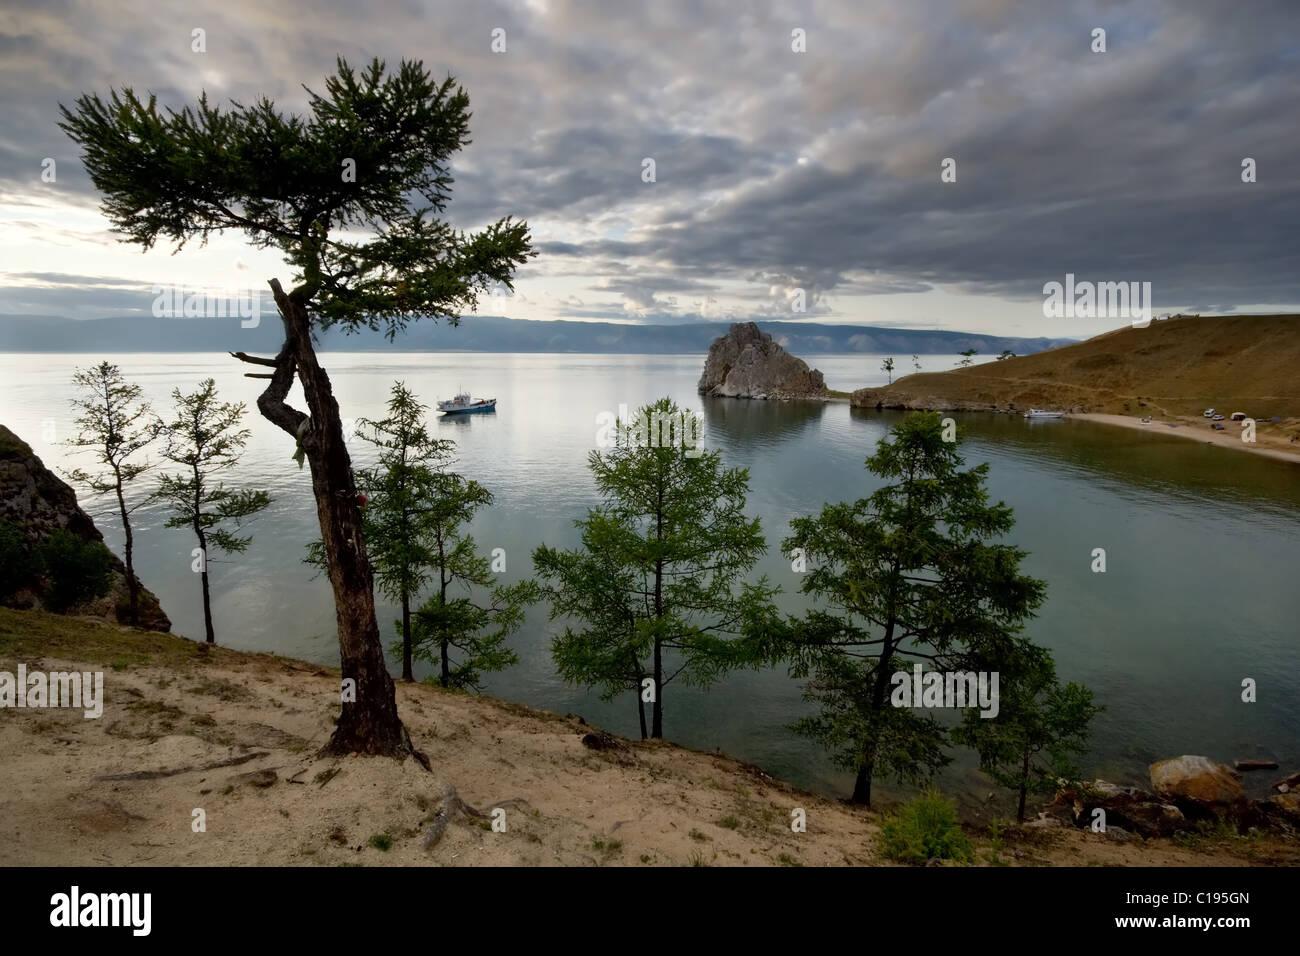 Nature landscape. Baikal lake. Cape Burkhan. Olkhon island. Siberia. Russia. - Stock Image